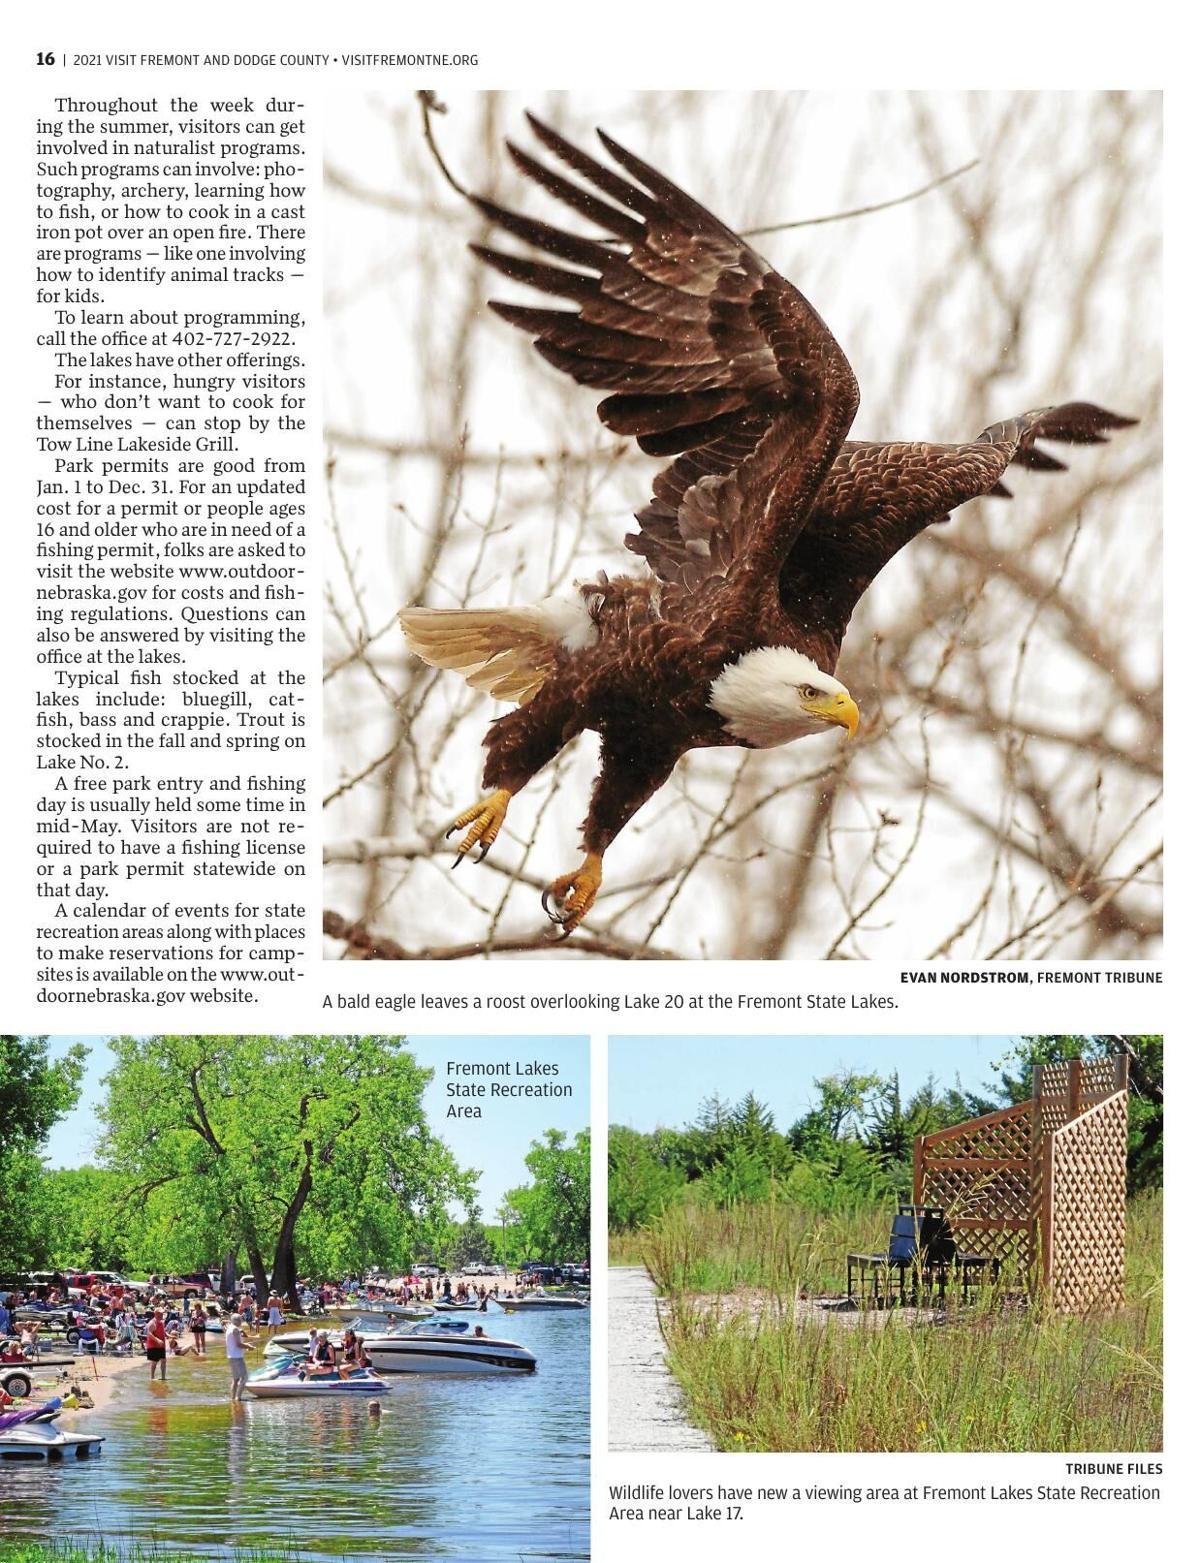 Visit Fremont and Dodge County 2021 16.pdf